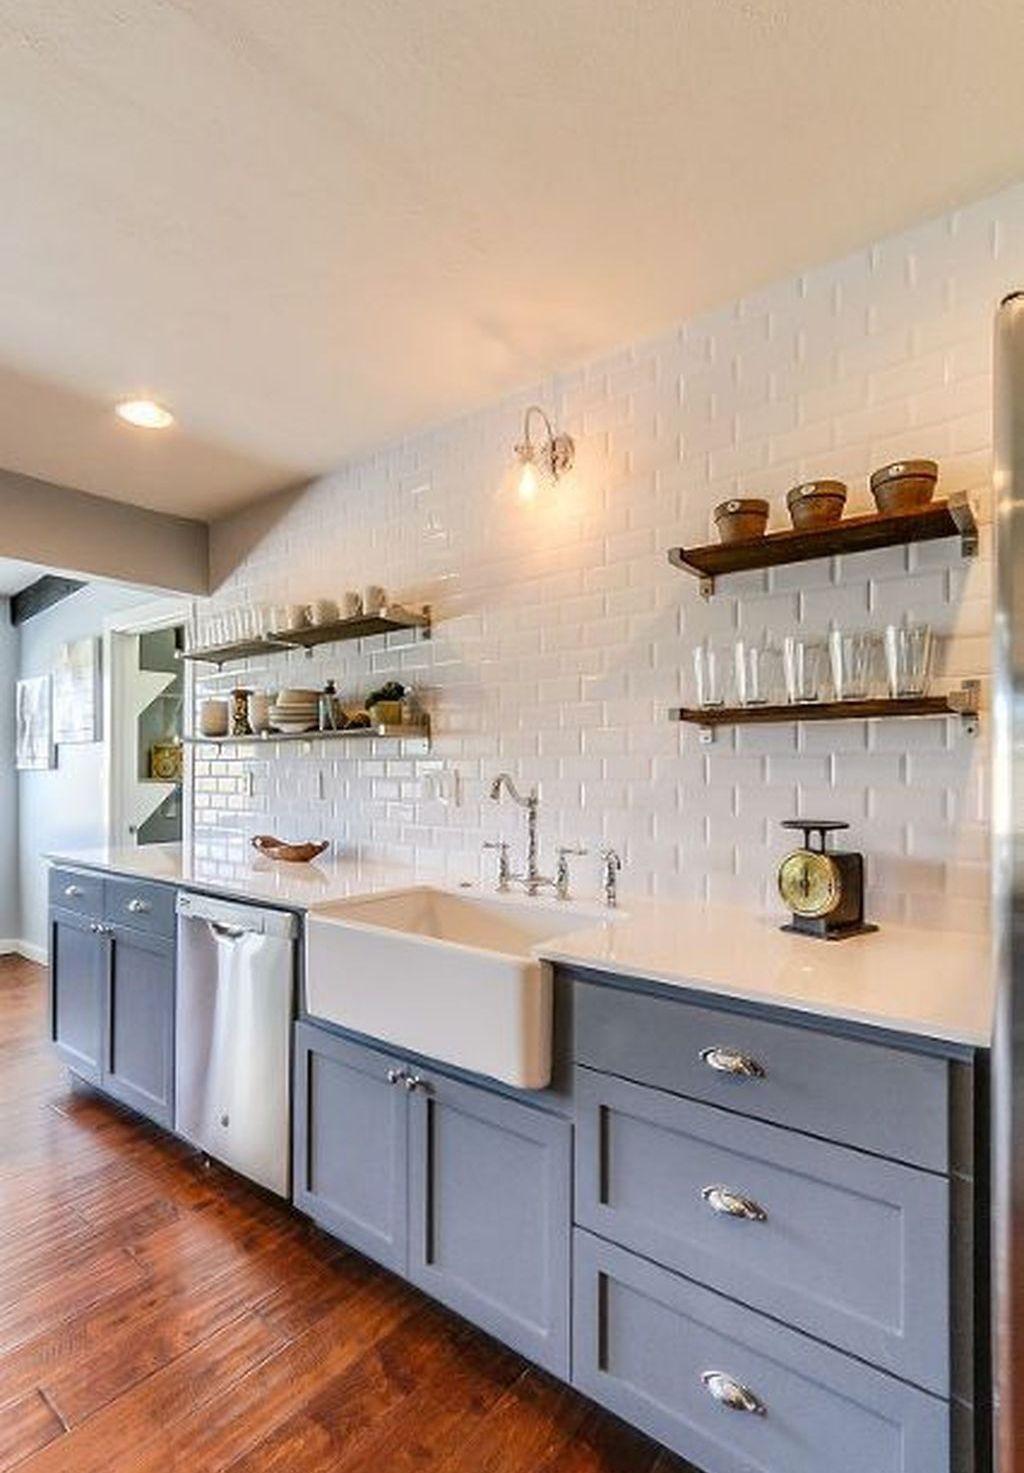 Awesome wonderful simple kitchen remodel ideas https centeroom also  interiors rh pinterest